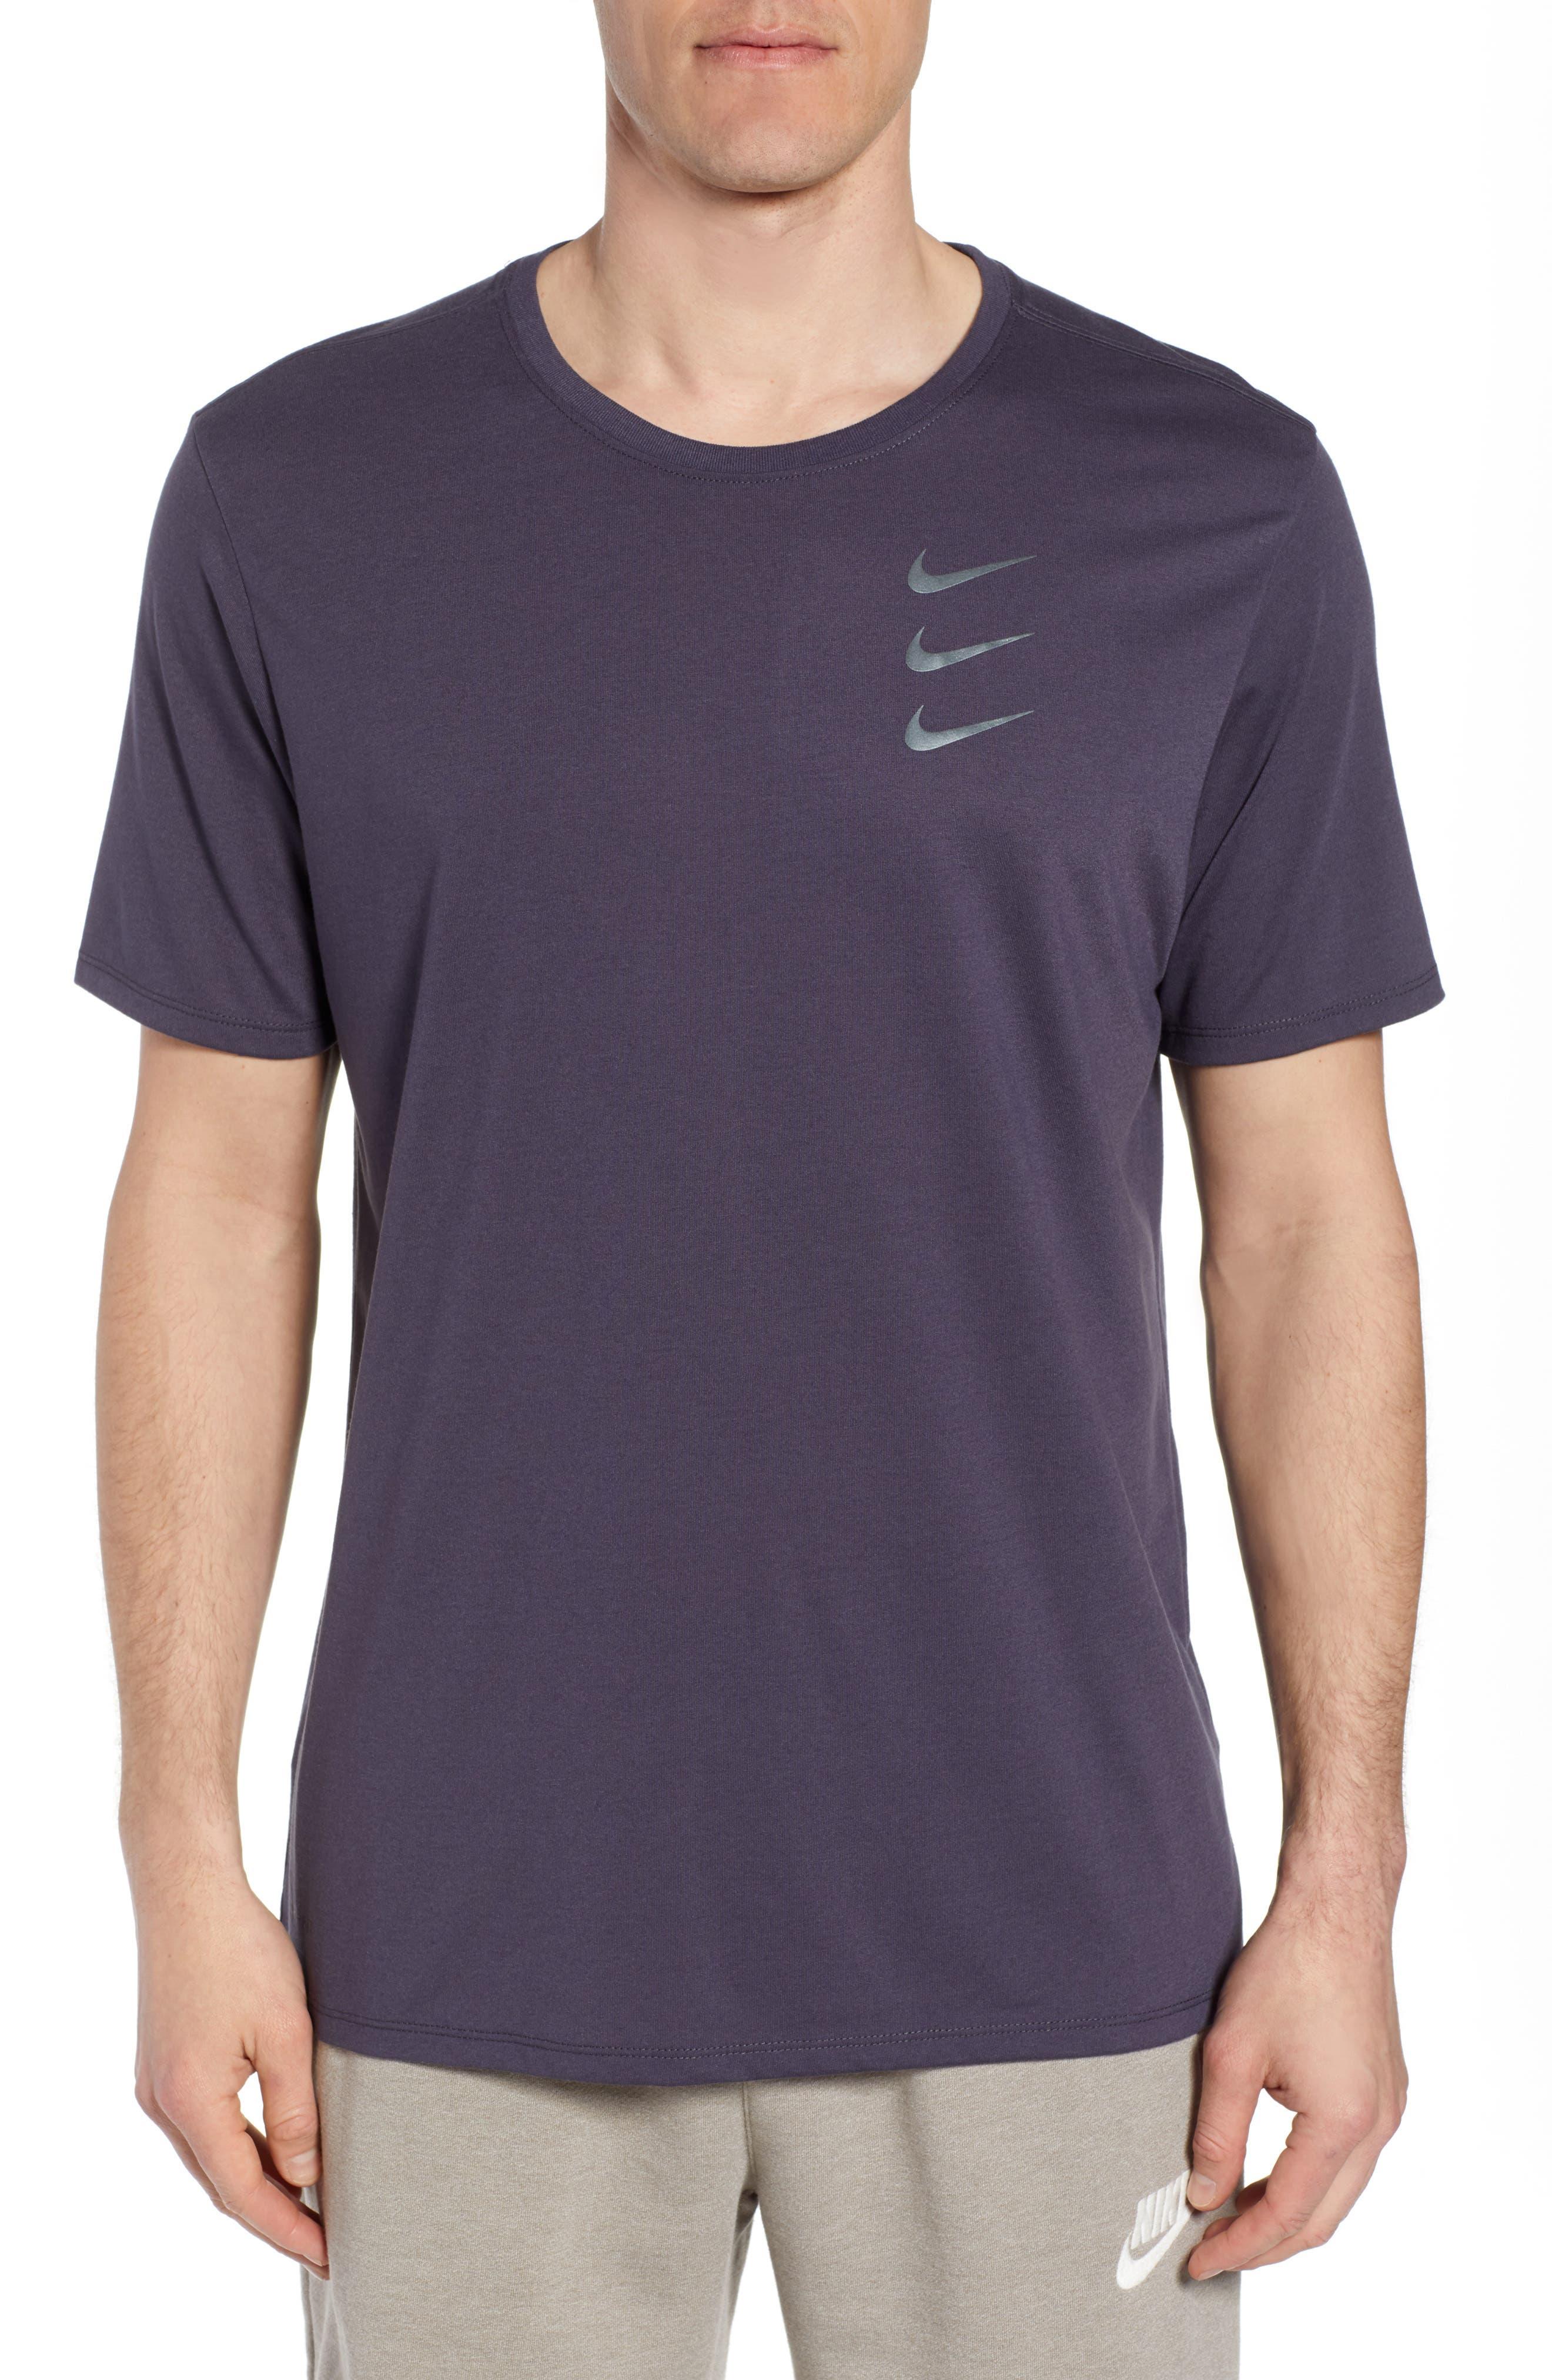 Nike Dry Running Division T-Shirt